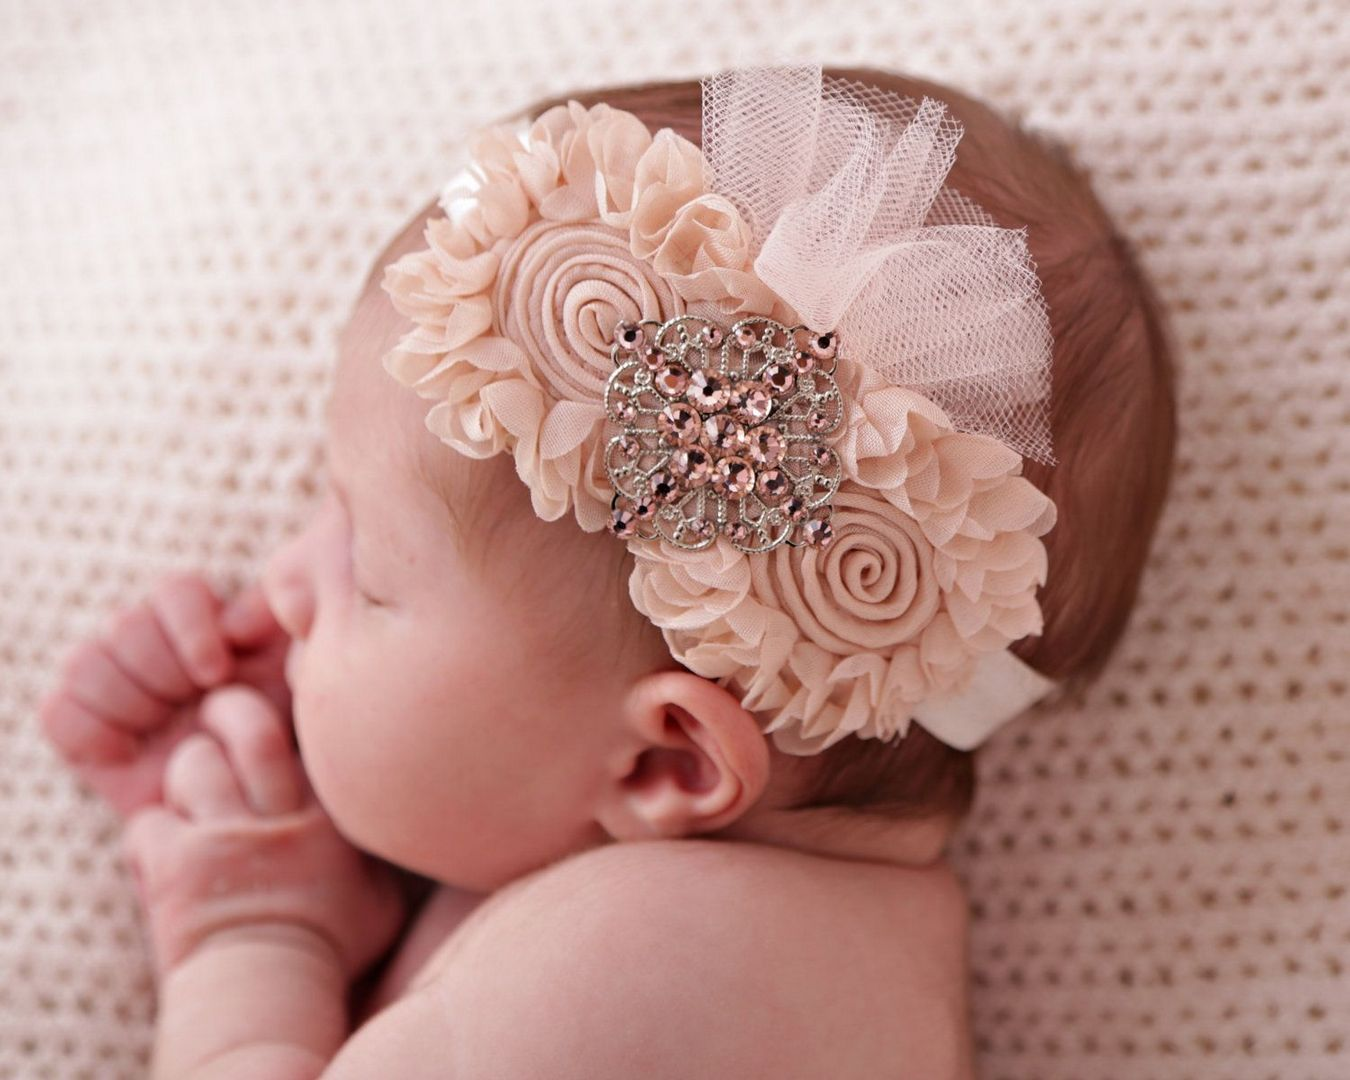 Baby-Buckles-1837